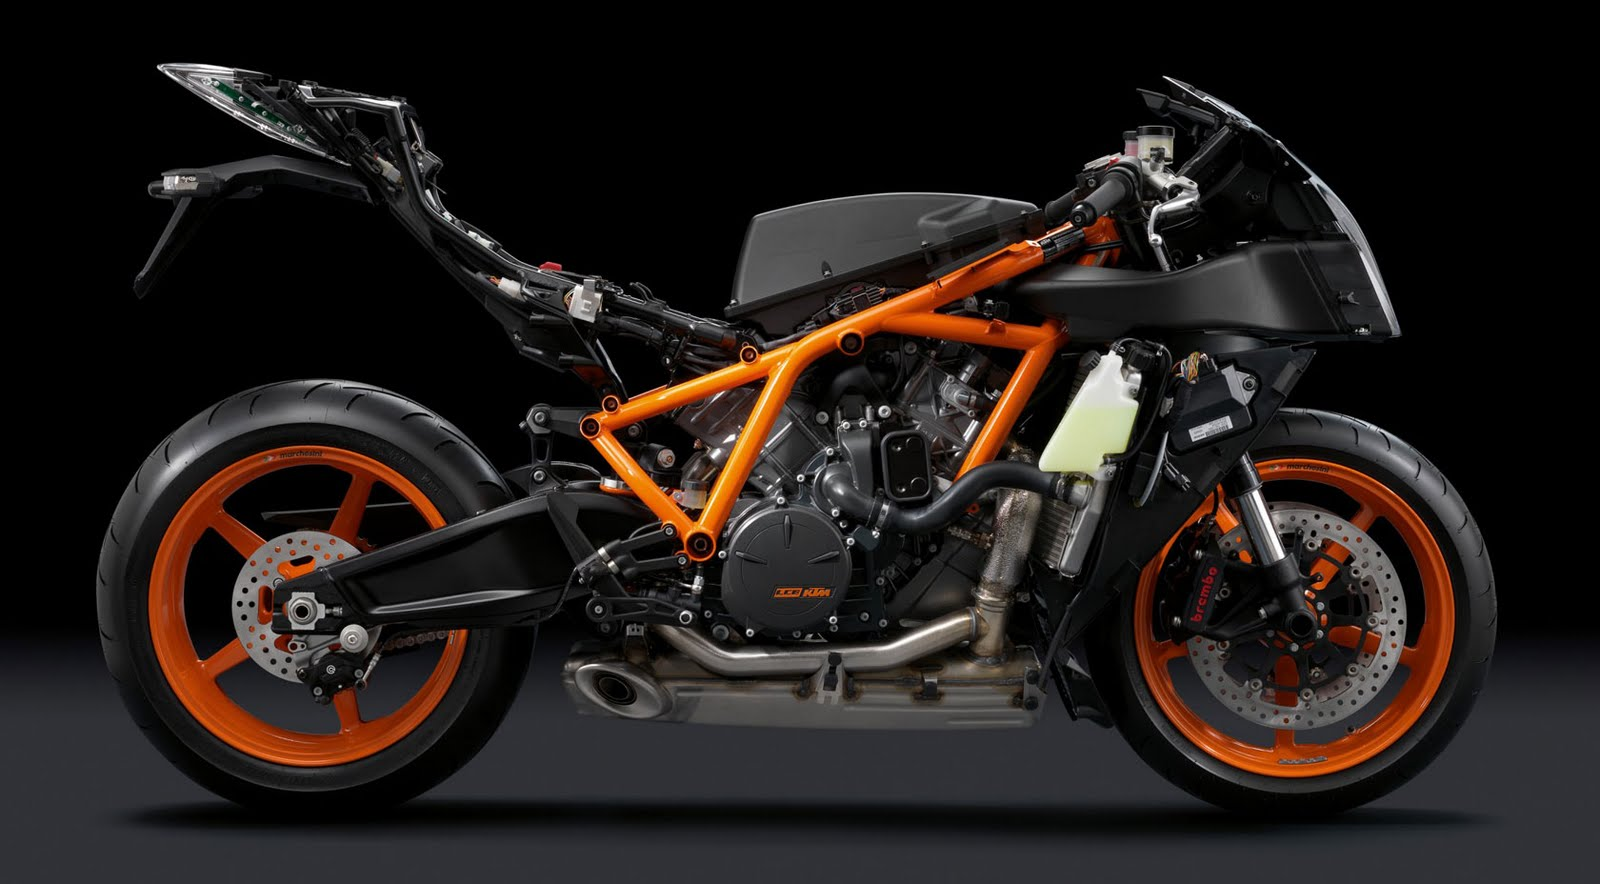 2011 Ktm 1190 Rc8r Photo Gallery Autos Motorcycles